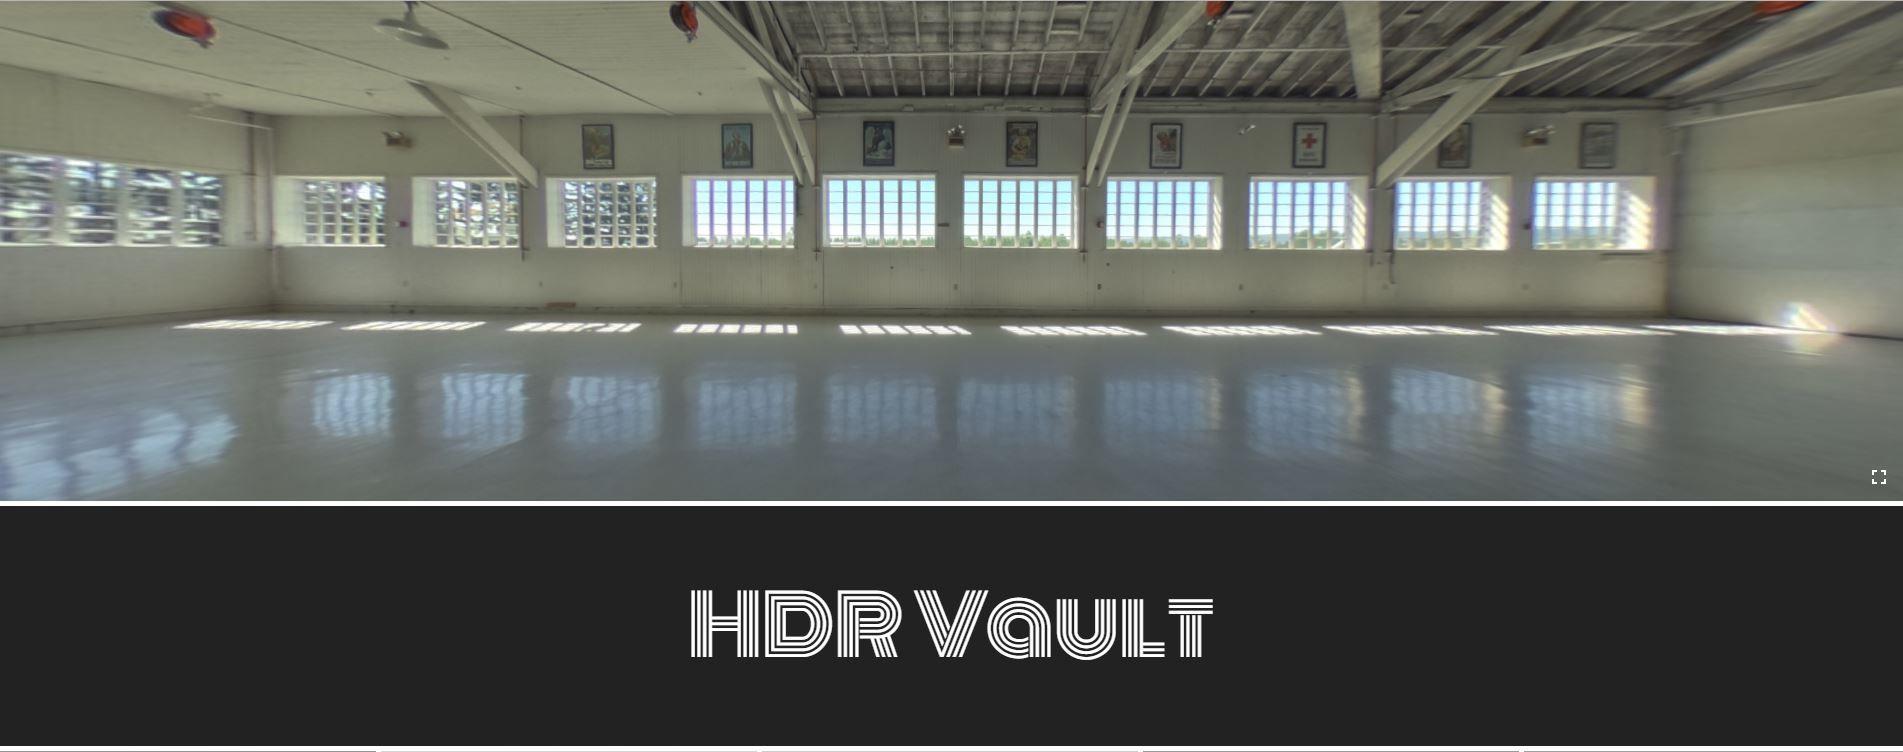 HDR Vault